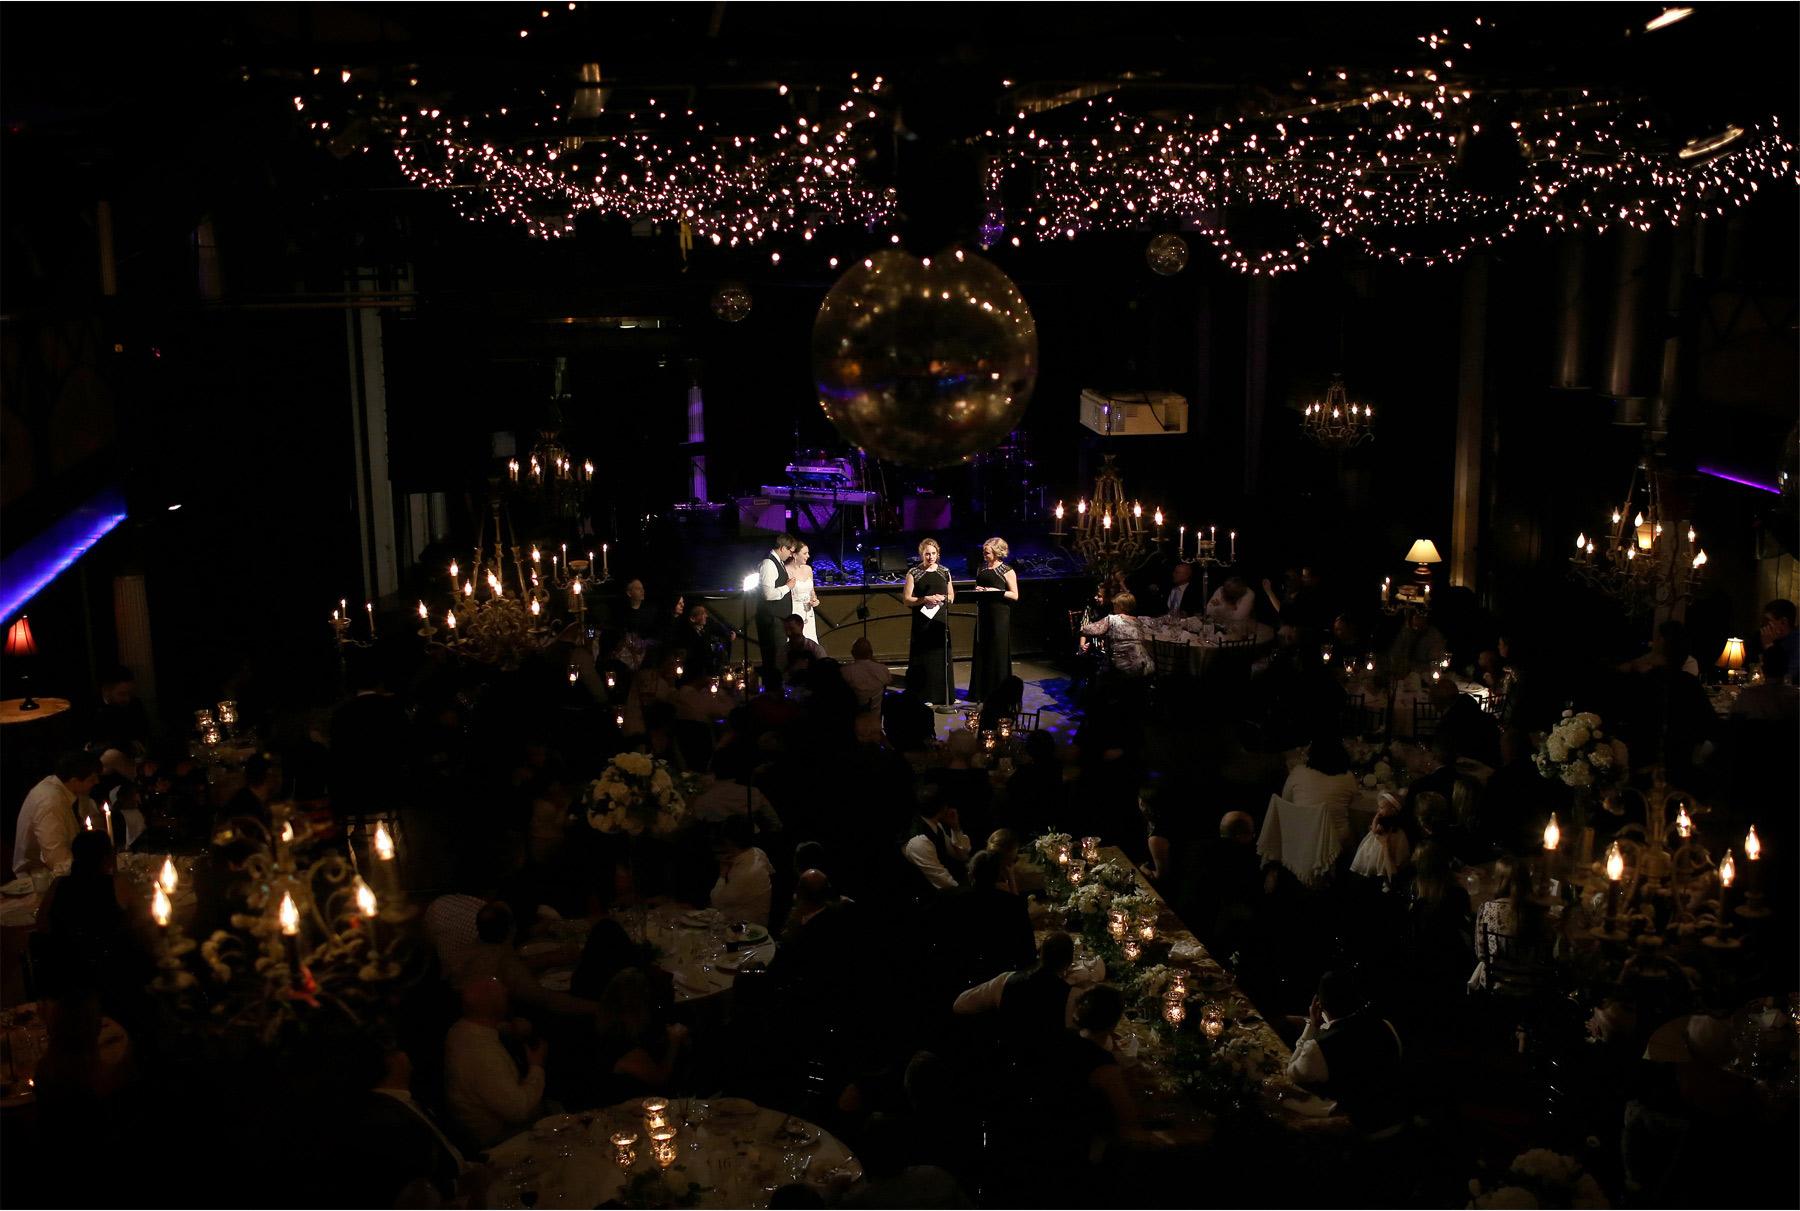 19-Minneapolis-Minnesota-Wedding-Photographer-by-Andrew-Vick-Photography-Winter-Varsity-Theater-Reception-Bride-Groom-Bridesmaids-Speeches-Sara-and-Rob.jpg